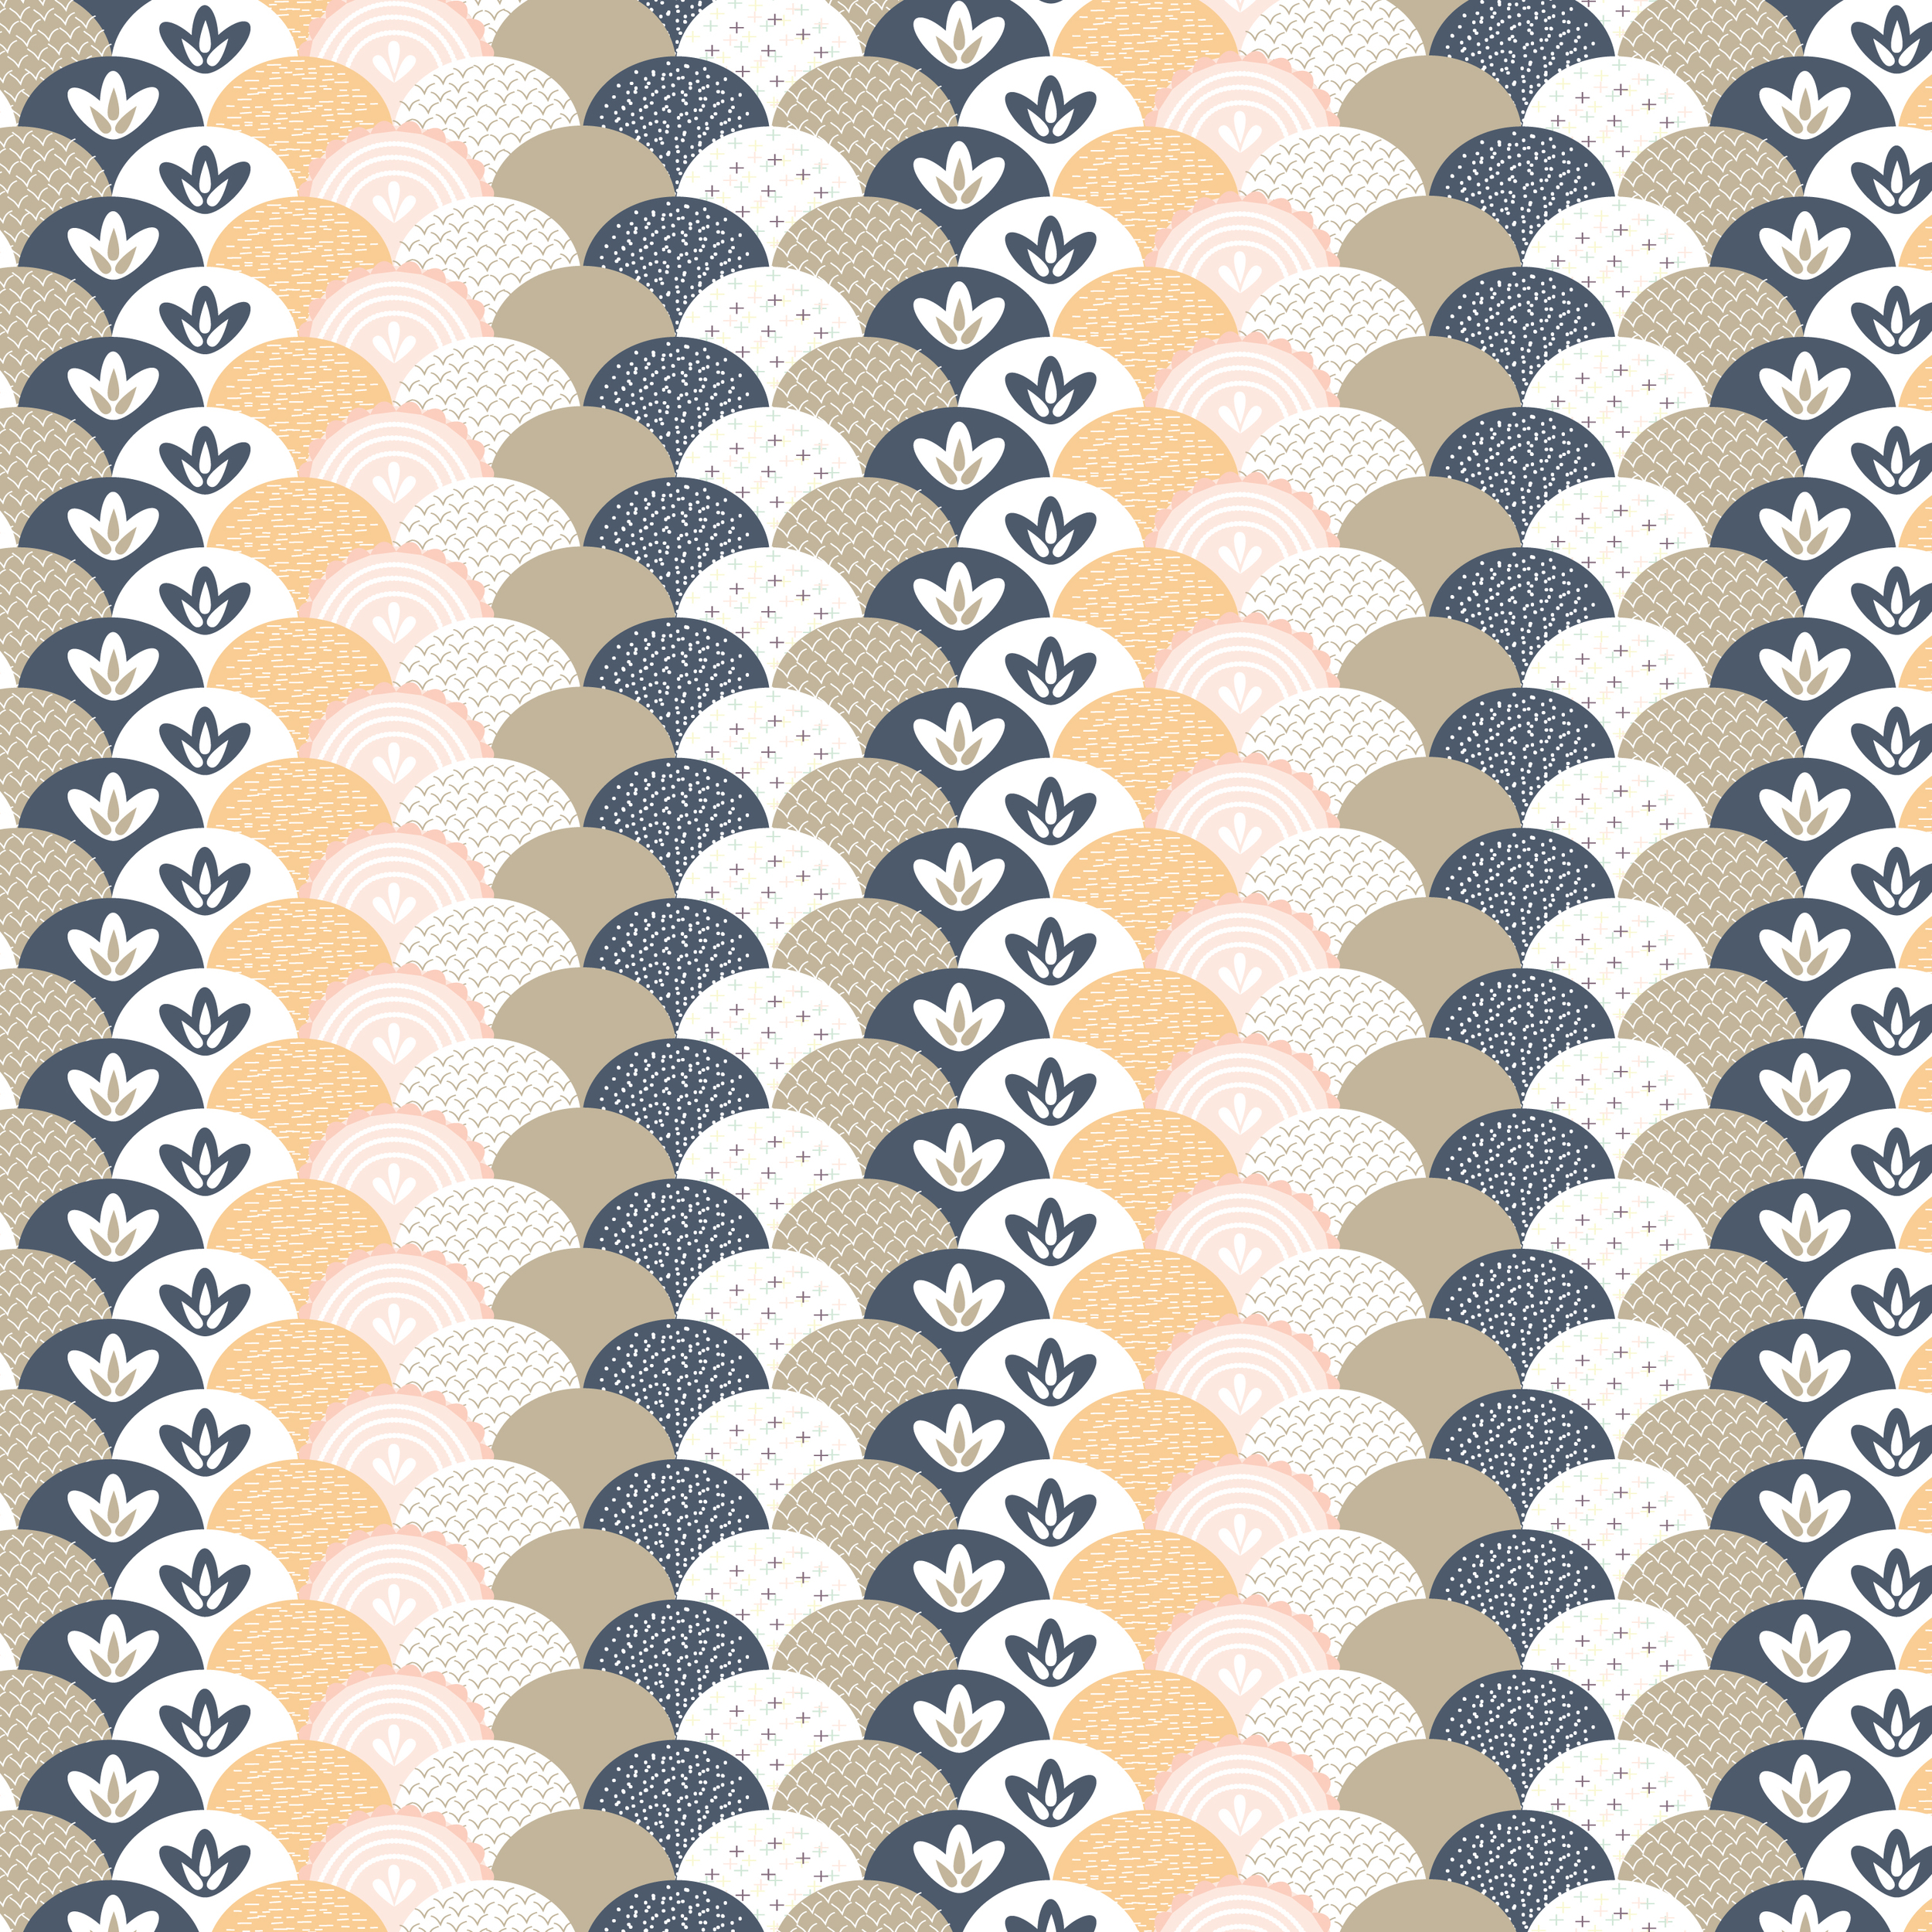 Scallops-pastels.jpg